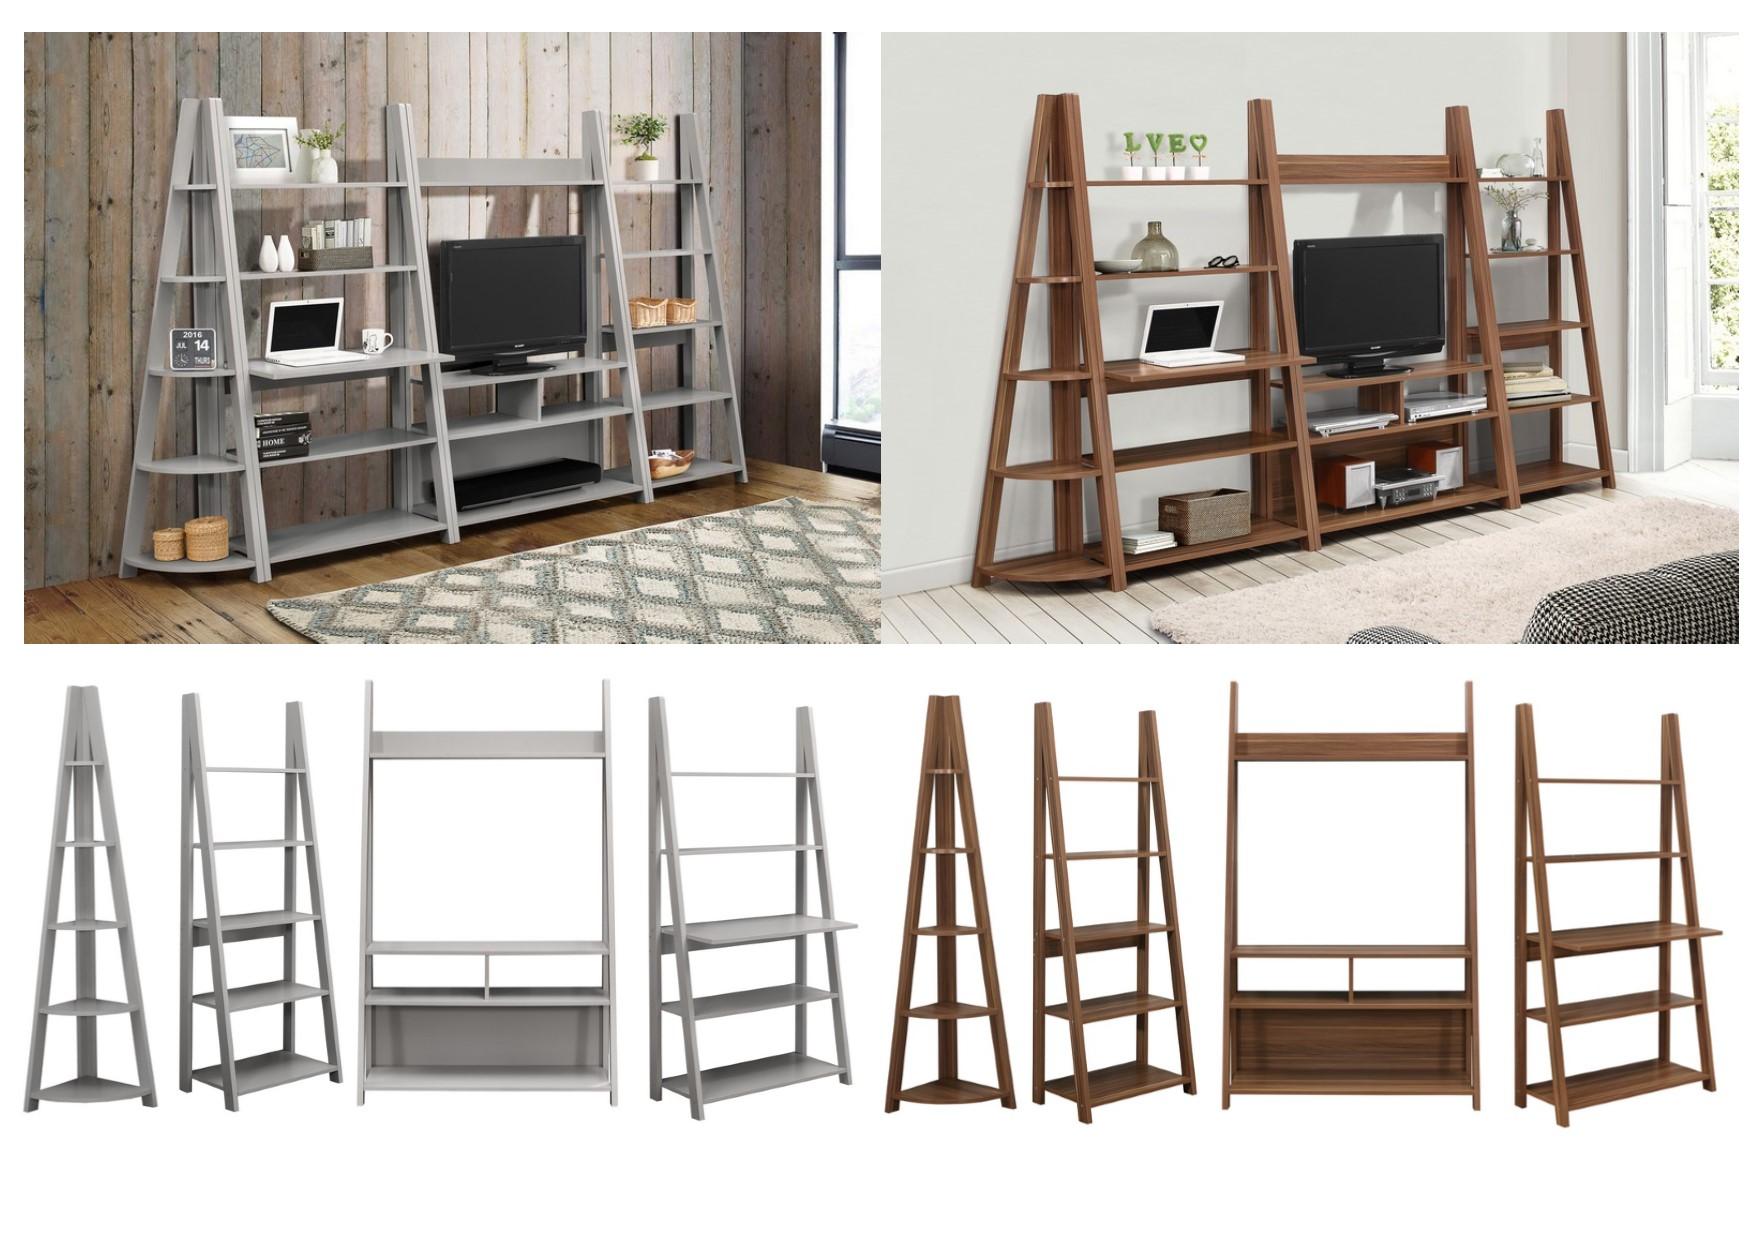 9b5e4736c1ee Birlea Nordic Ladder Shelving Units - Bookcases Tv Unit Desk - Grey Walnut